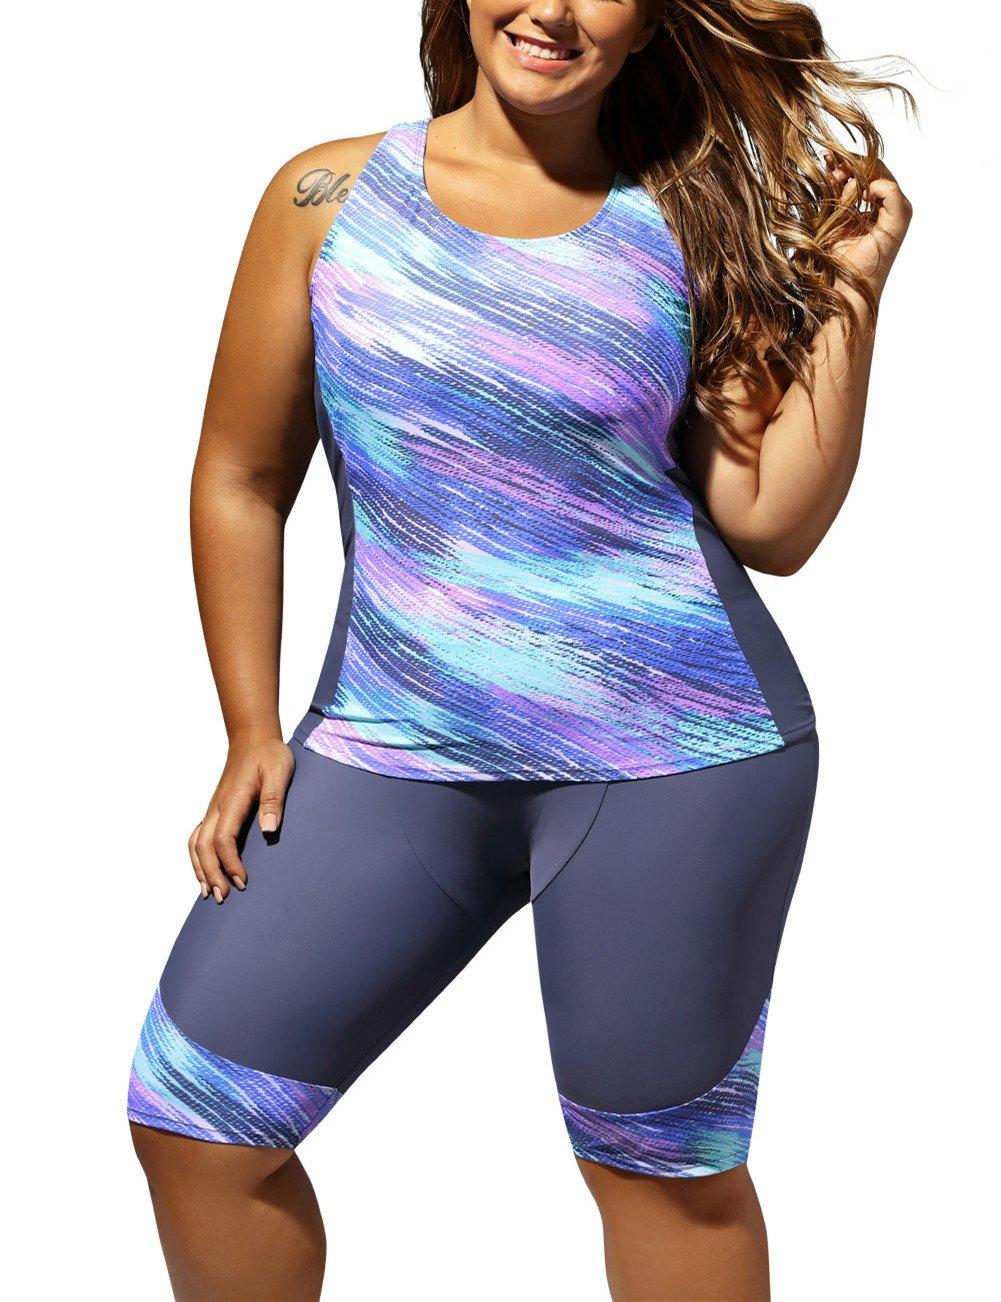 Gludear Womens Color Block Boyleg Plus Size Surf Swim Suit Rash Guard,Blue,5XL